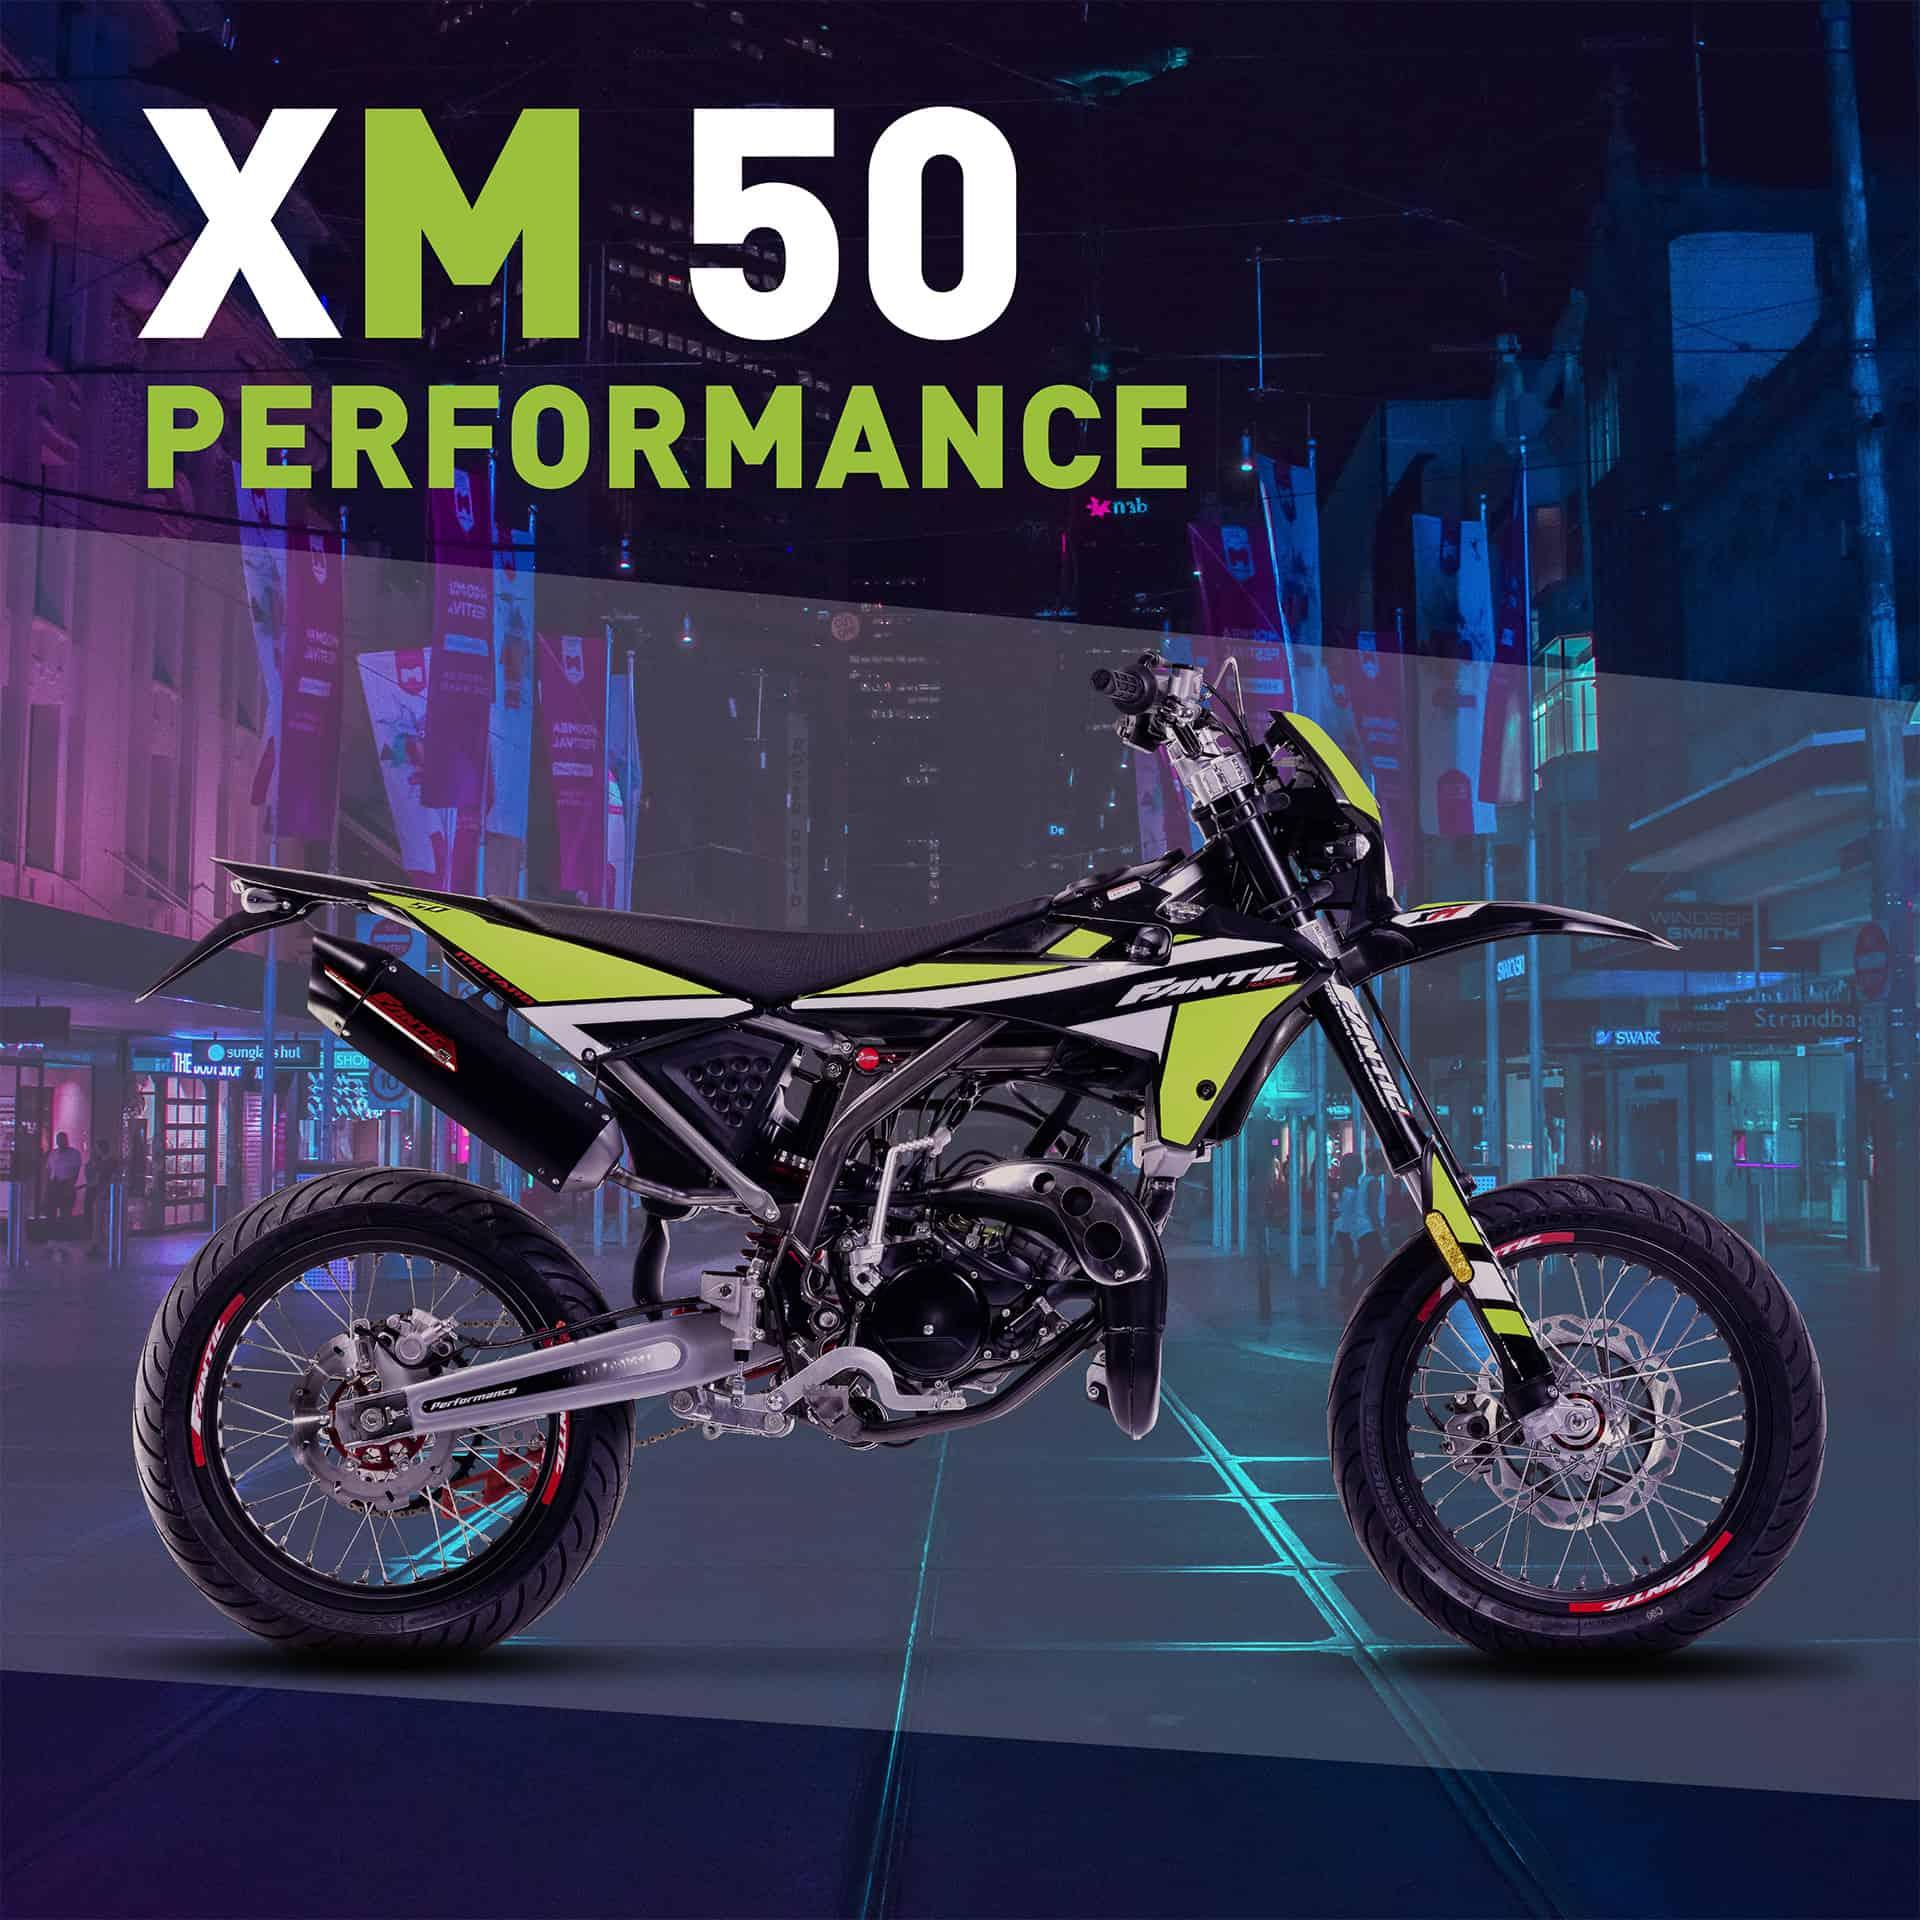 Fantic mopojen Motard mallisto 2021, xm 50 Performance.